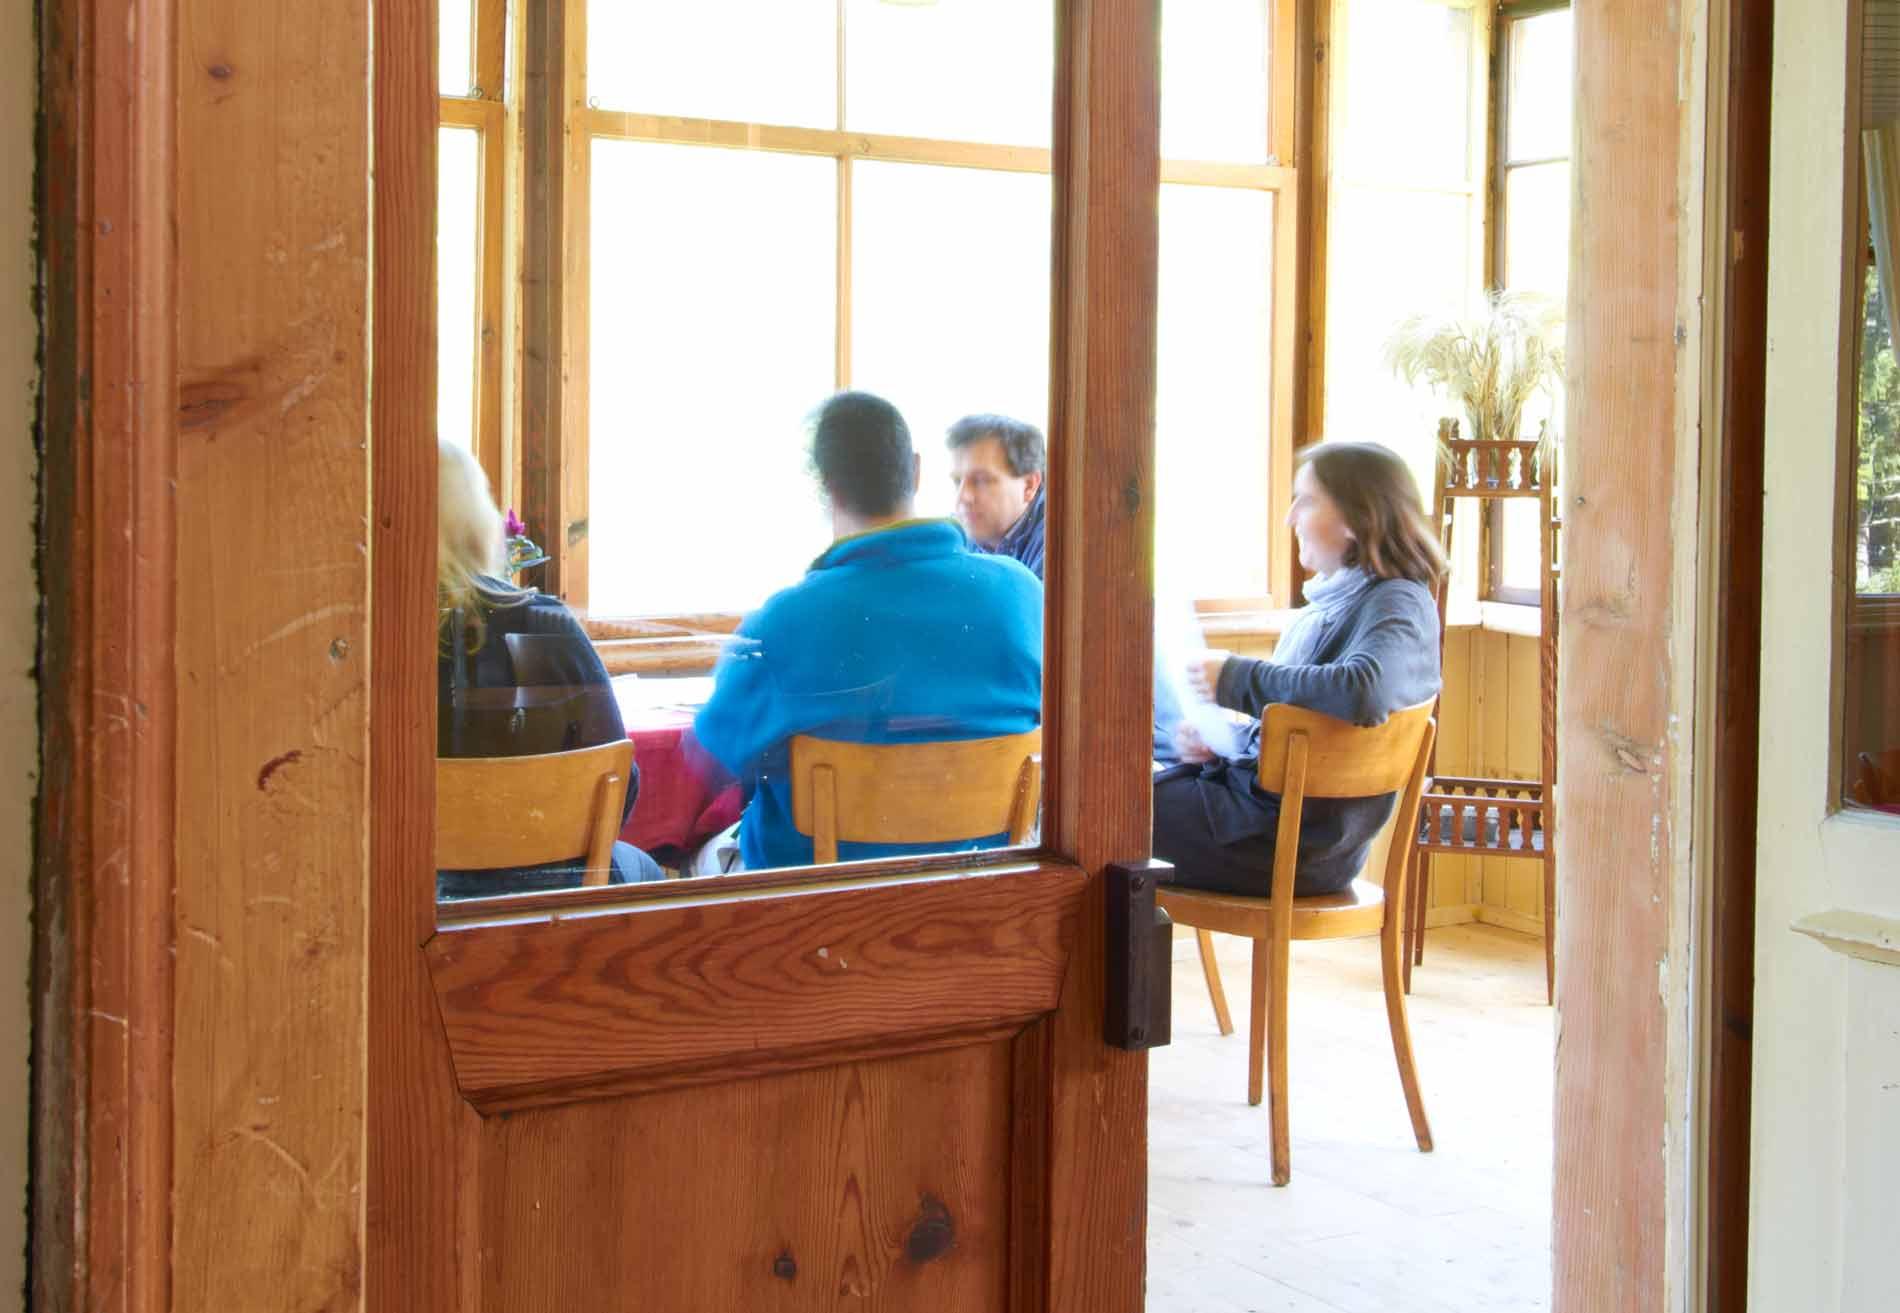 Meeting in der Veranda